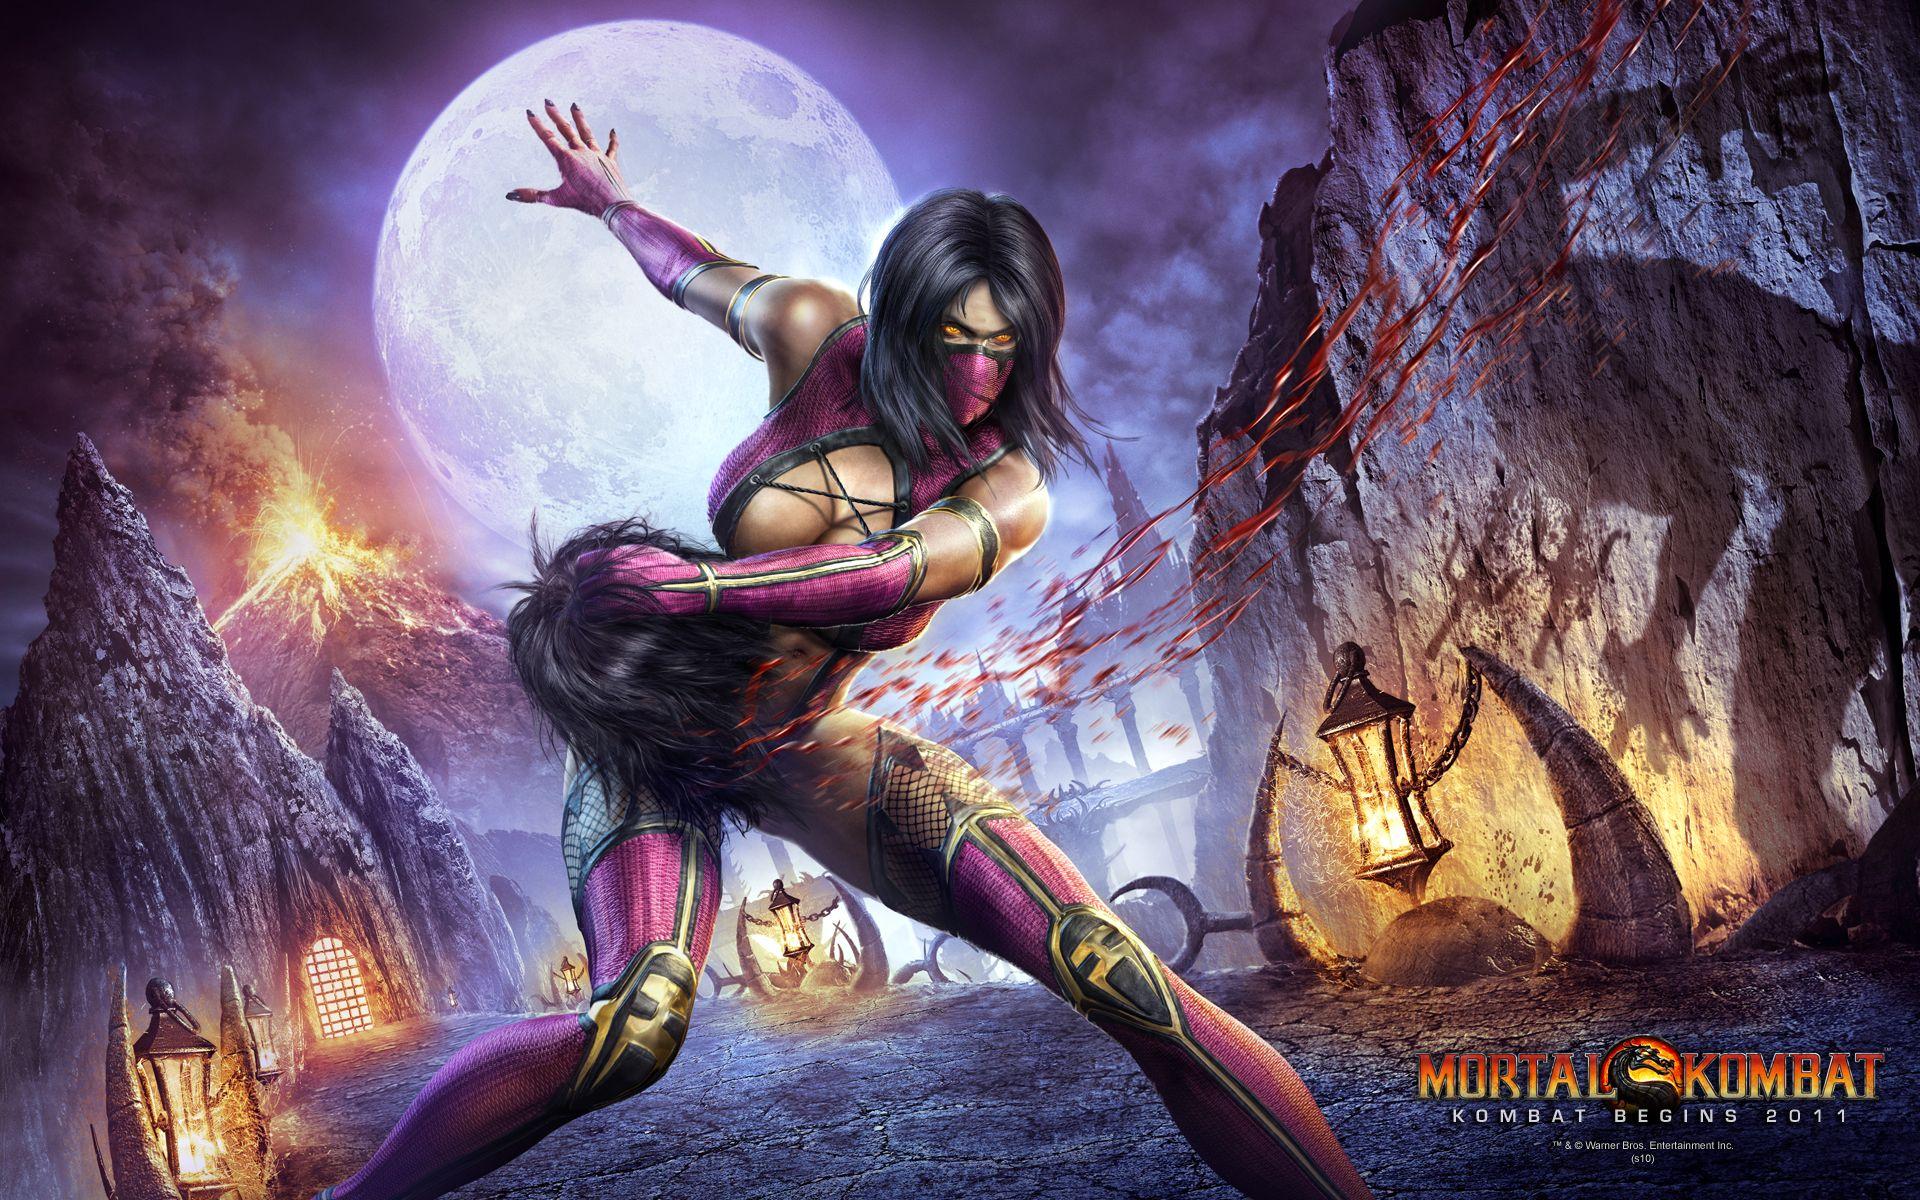 Mileena Mortal Kombat X Mileena Mortal Kombat 9 Wallpaper